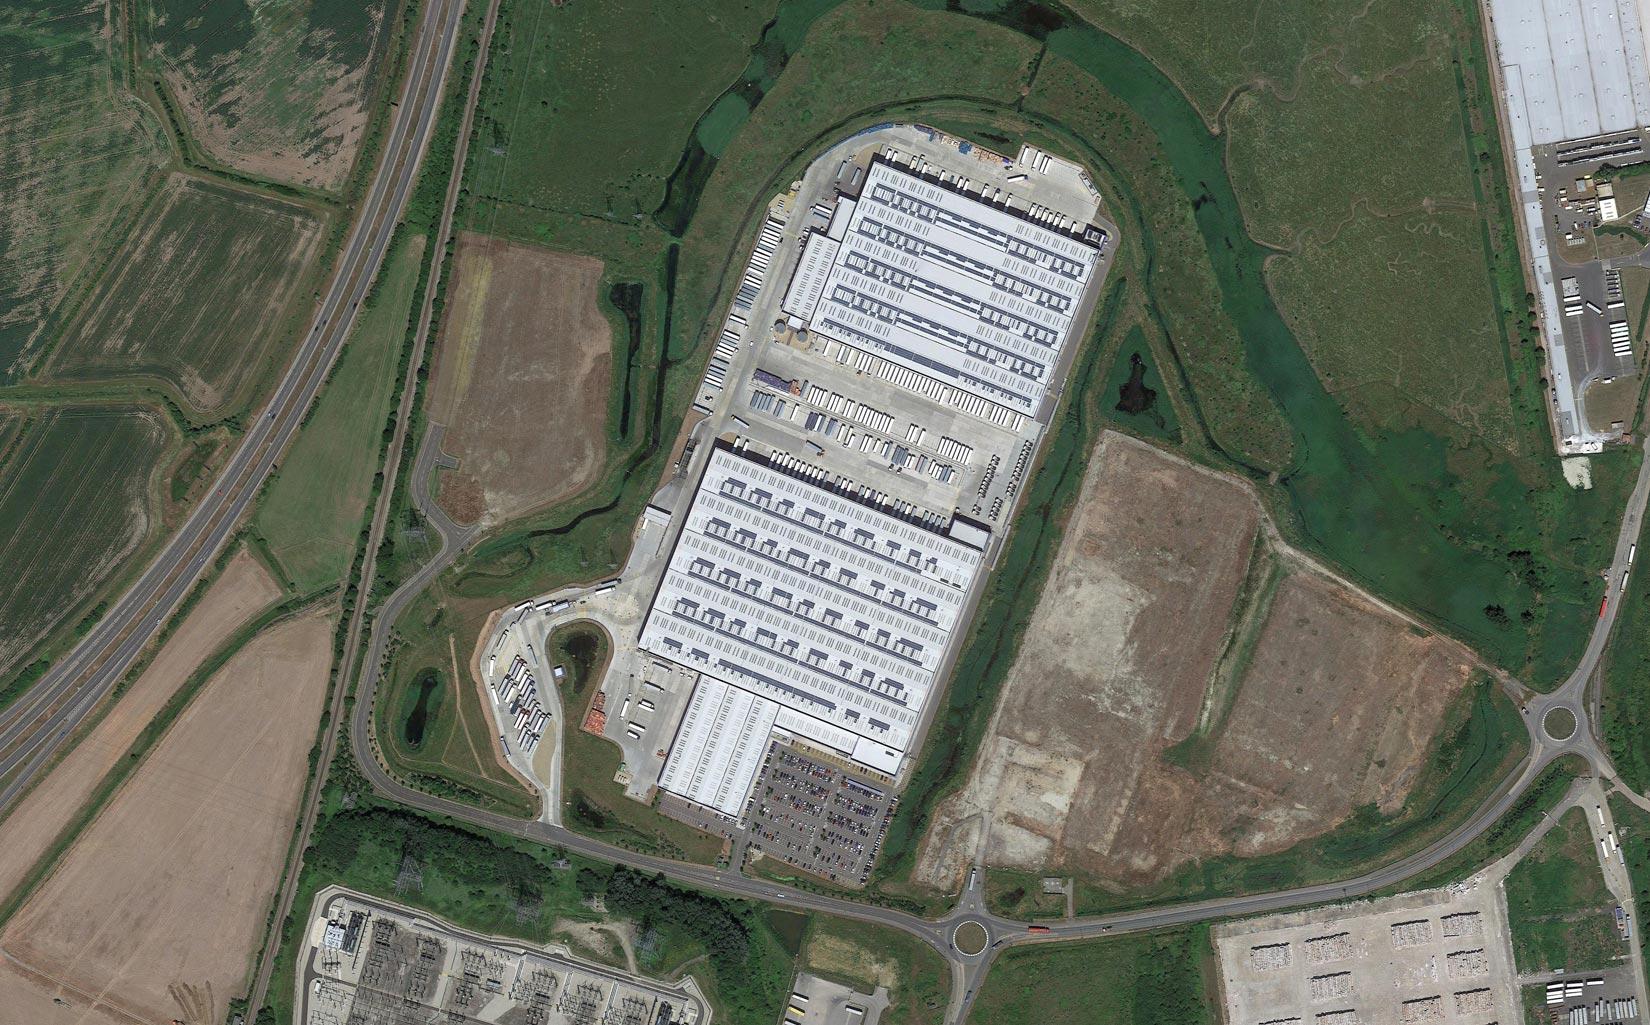 Morrisons Sittingbourne Distribution Centre, Aerial